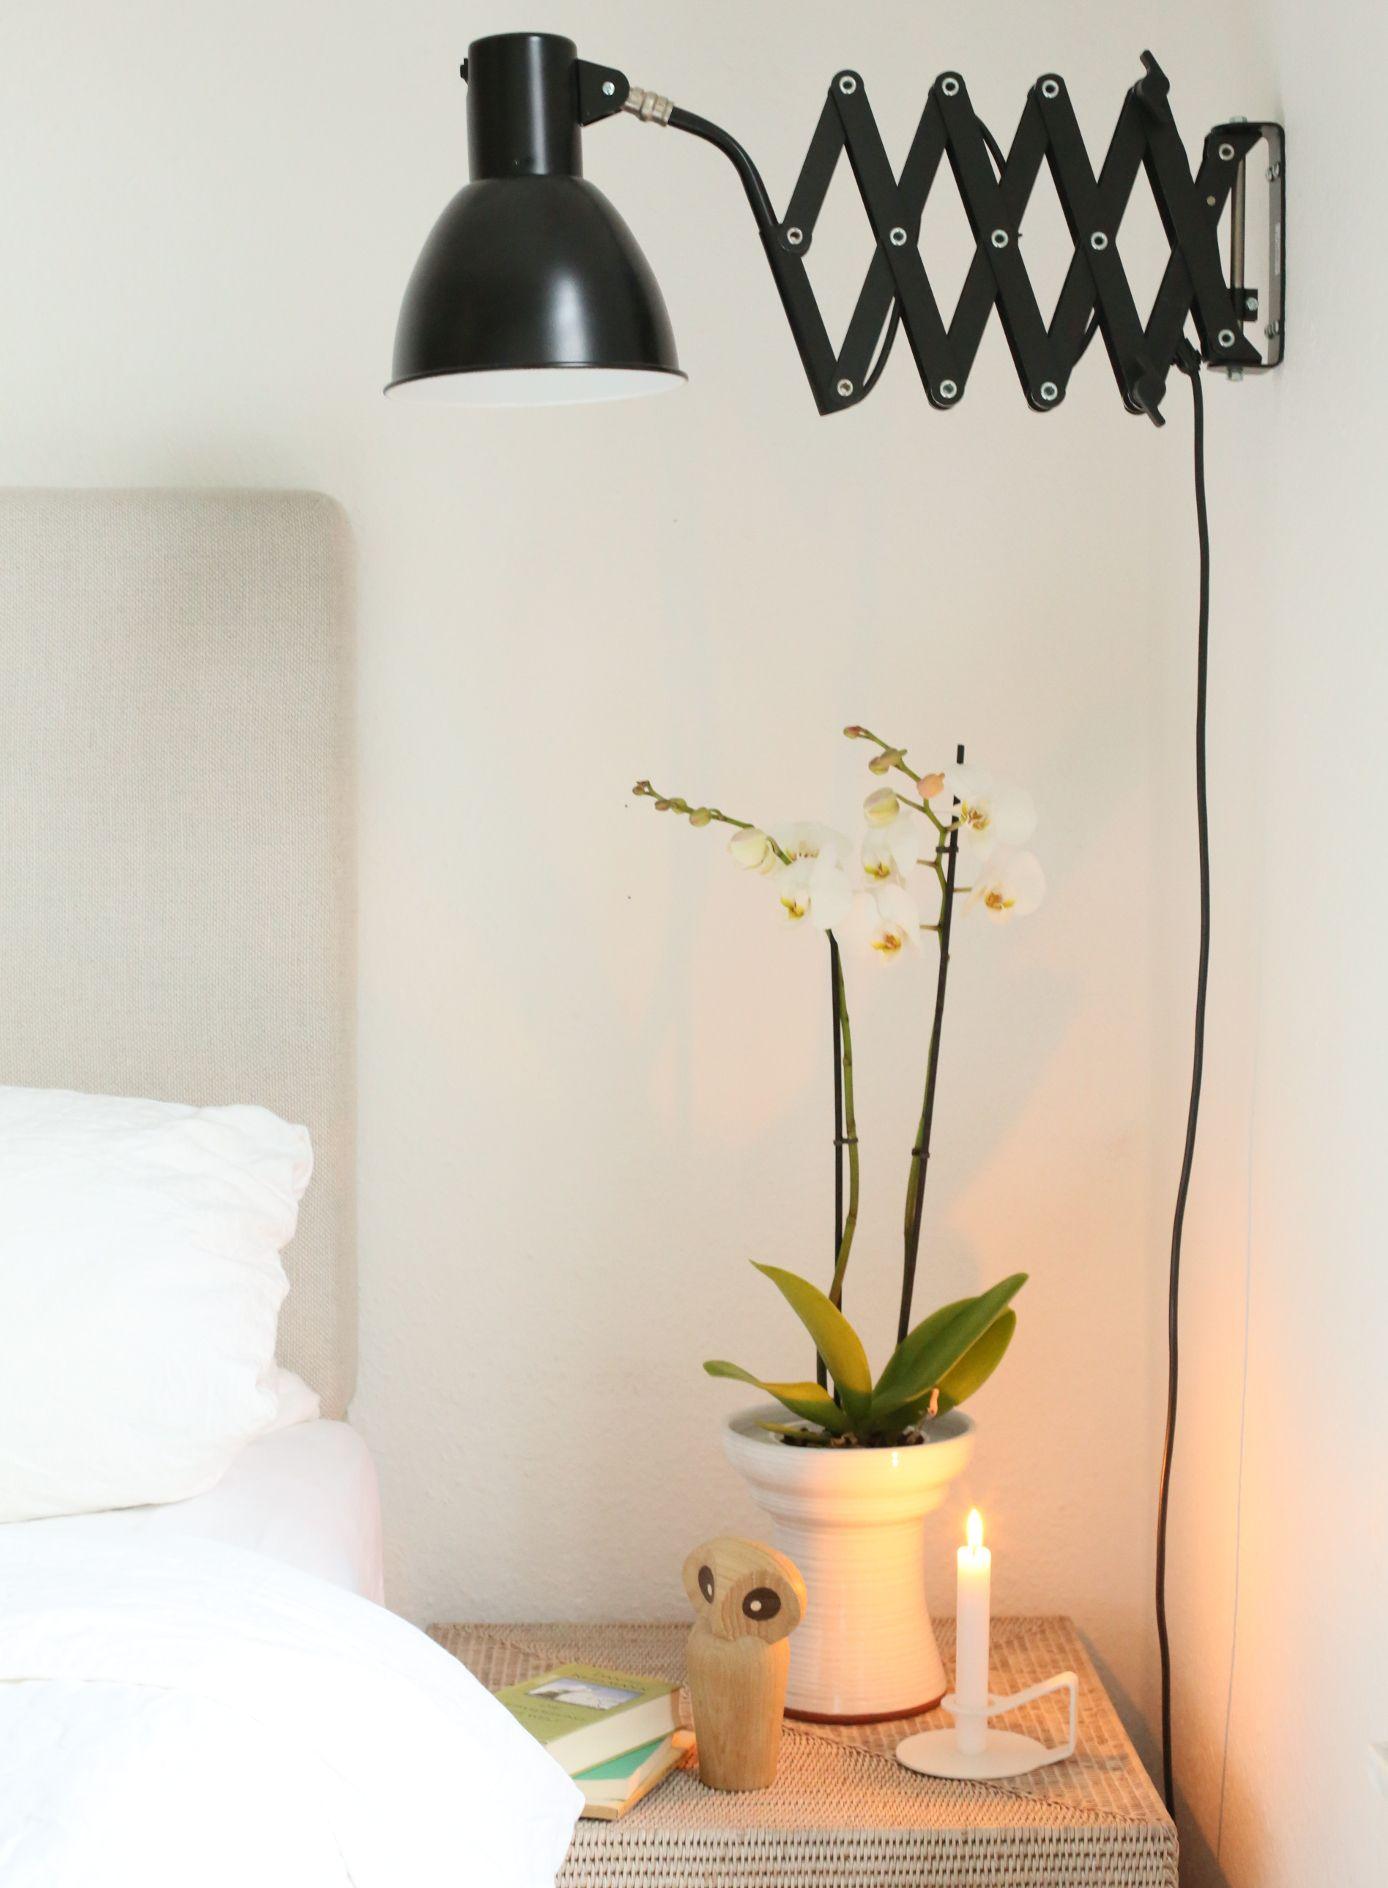 Schlafzimmer, Deko, Scherenlampe, Wandlampe, Eule, Ikea, Bett